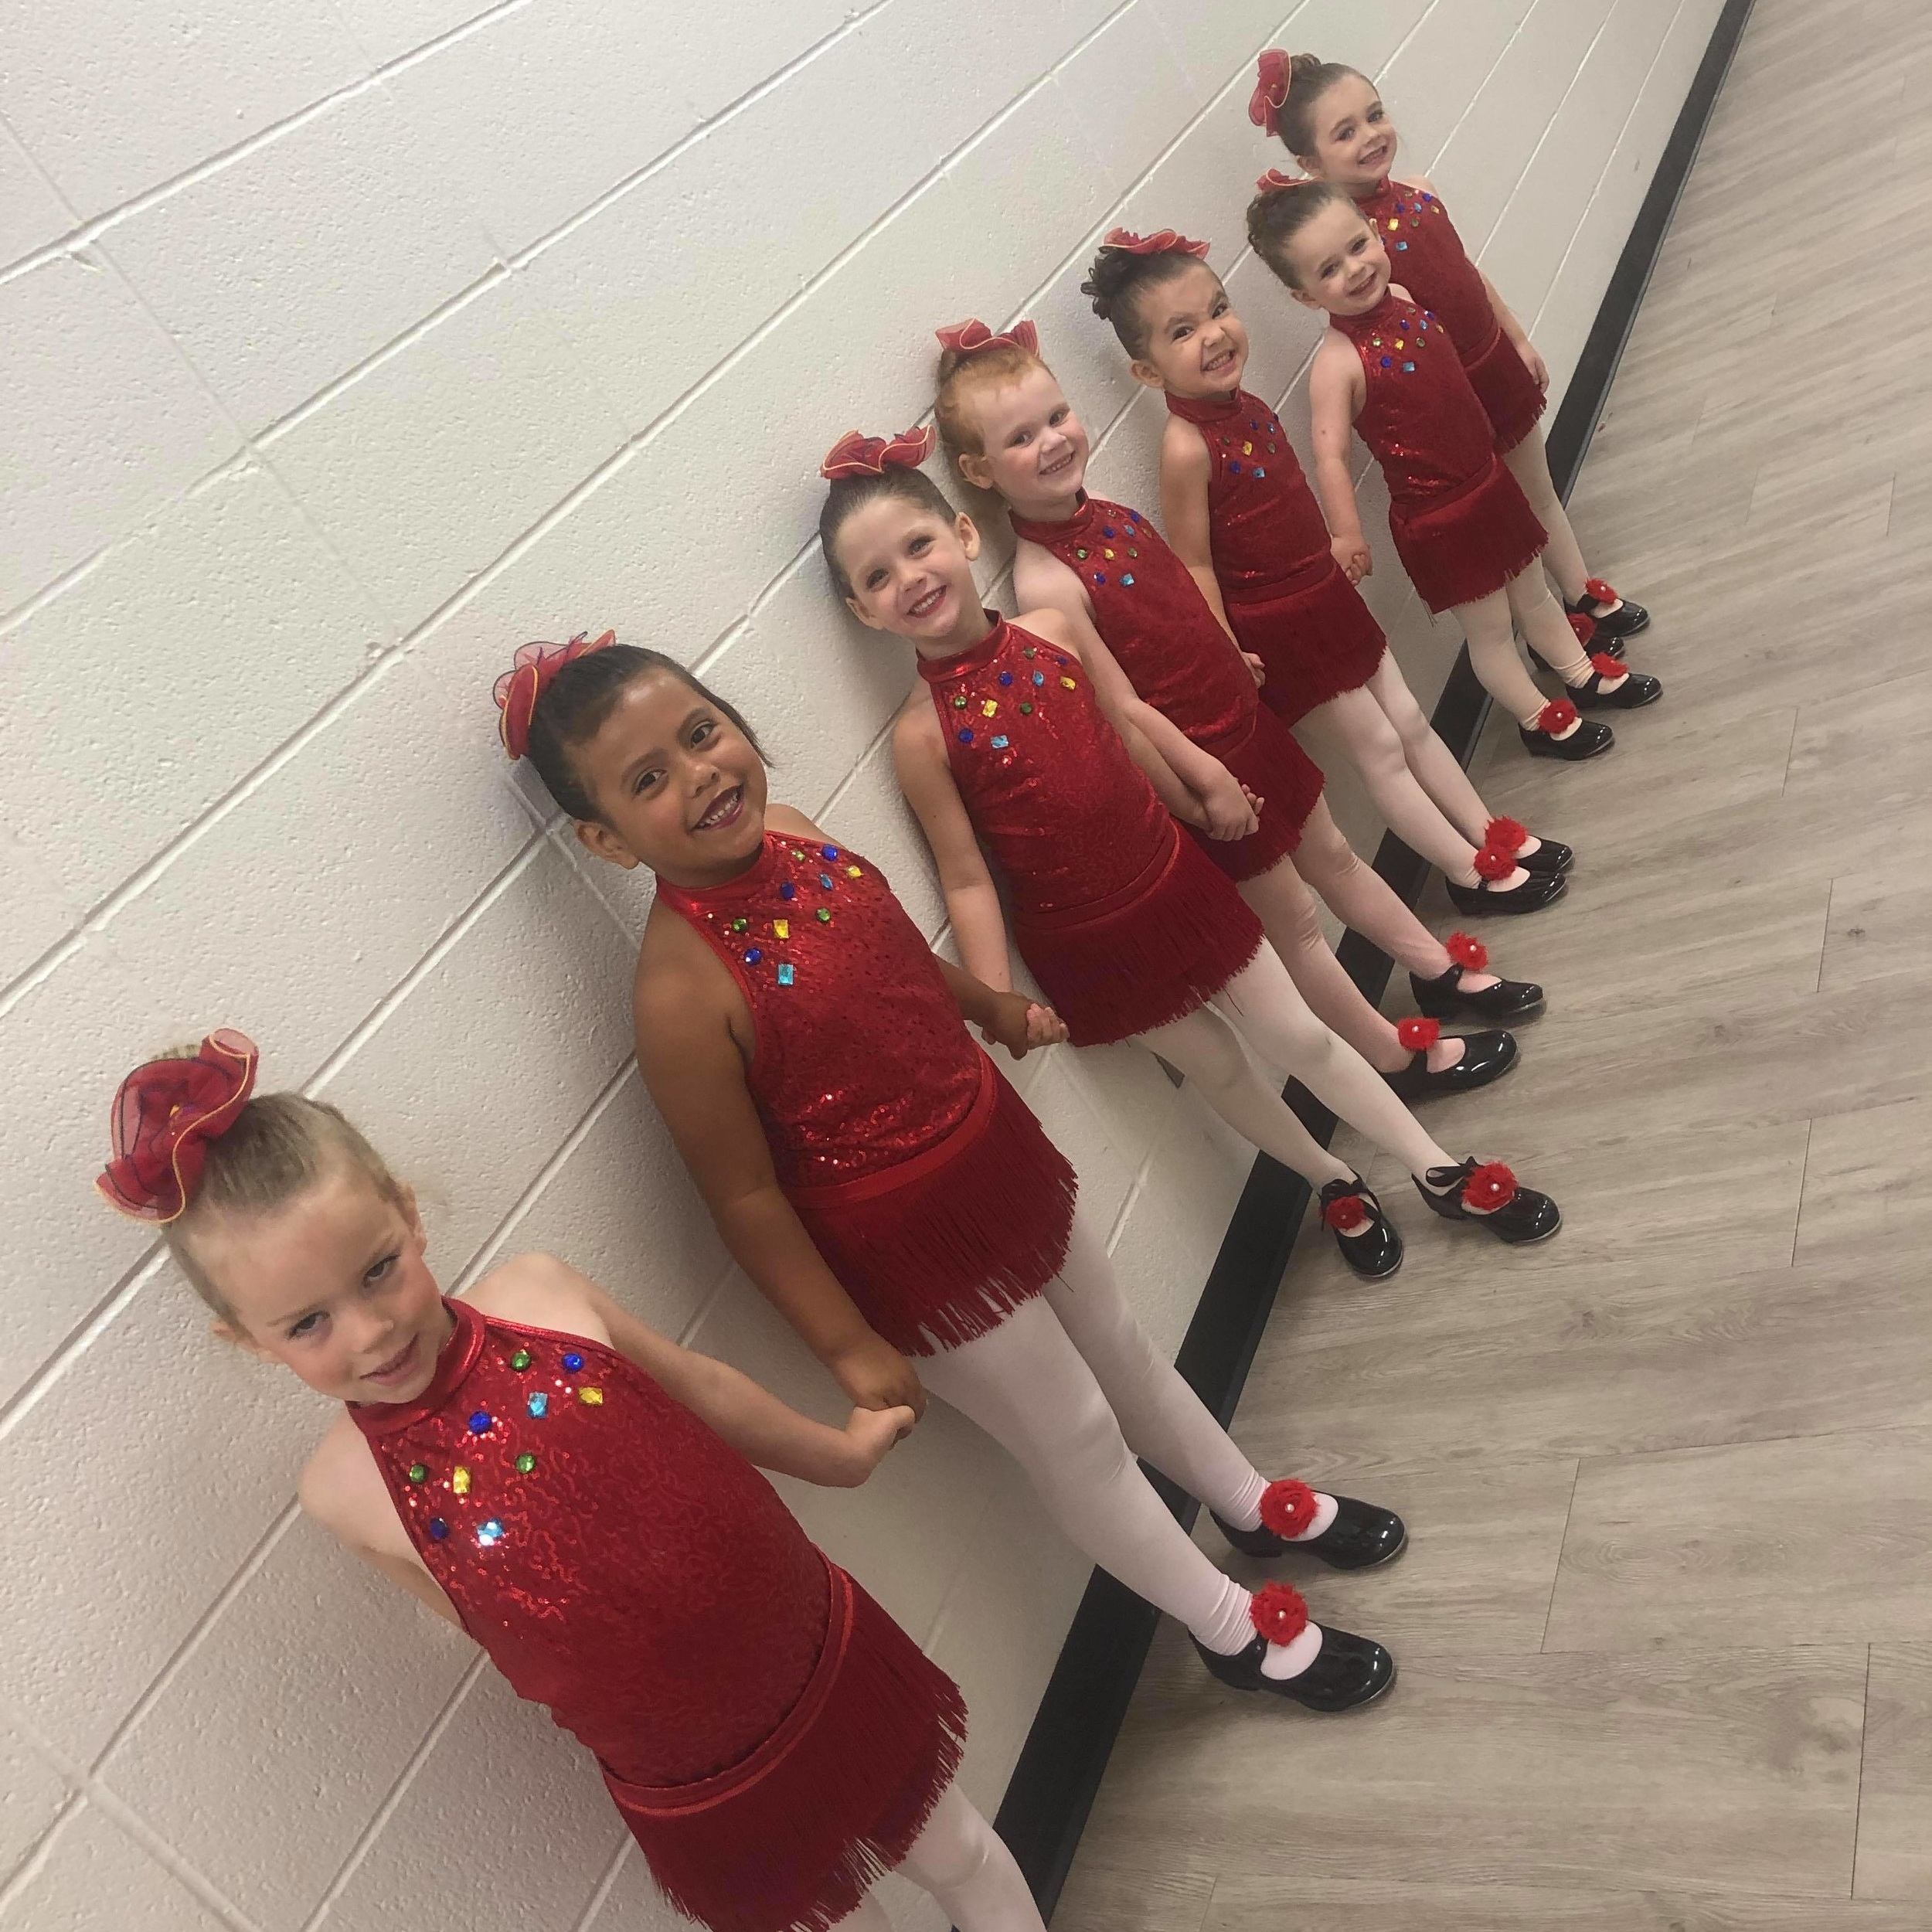 dance classes 3 years old bryan texas